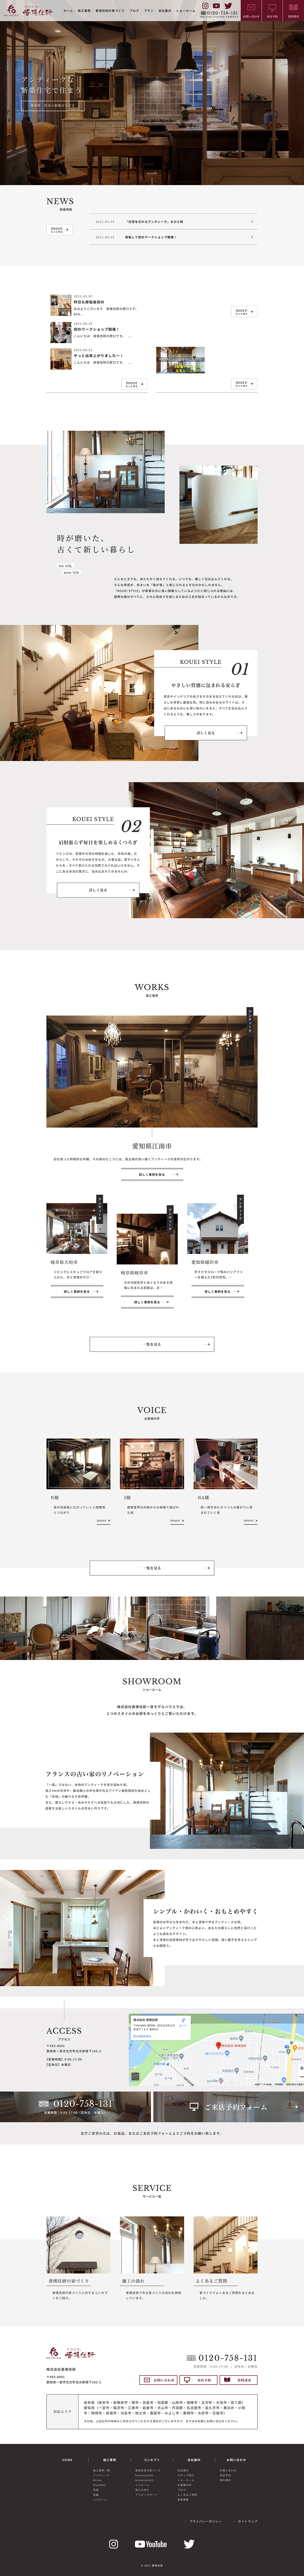 株式会社香瑛住研 様 PCデザイン